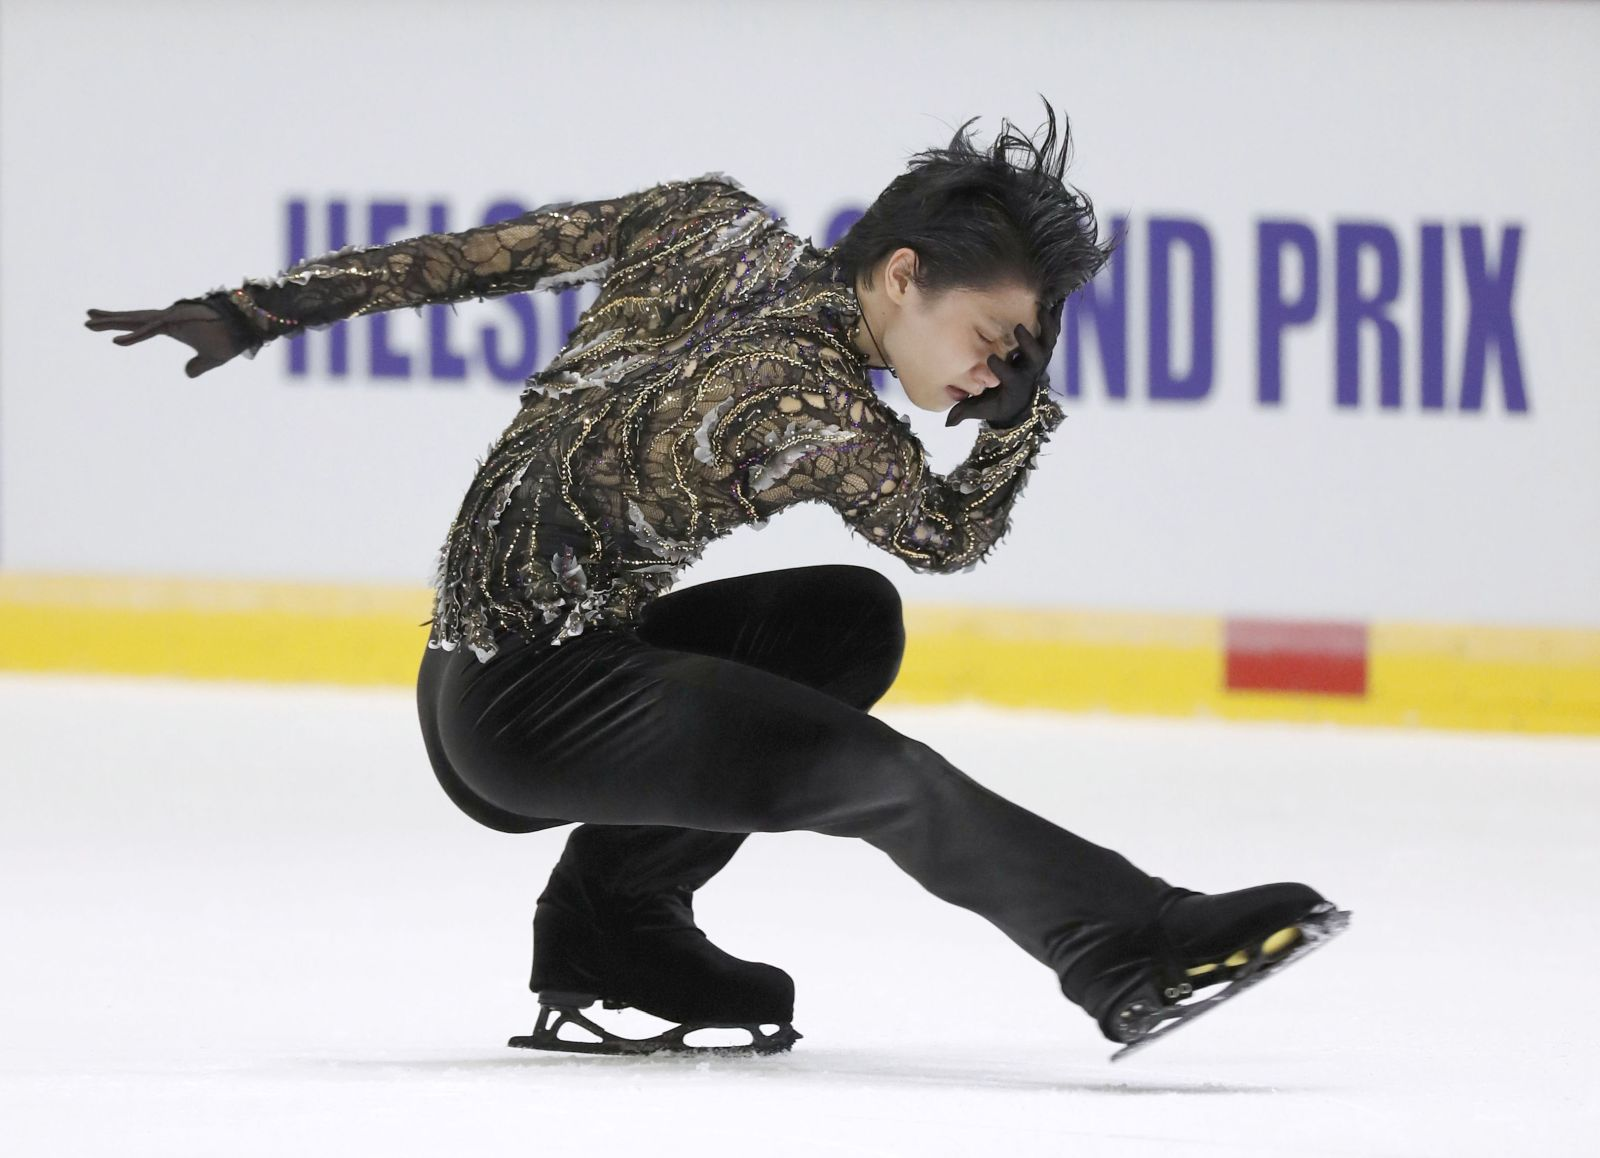 Olympic Medalist Yuzuru Hanyu Strikes Gold at Helsinki Grand Prix